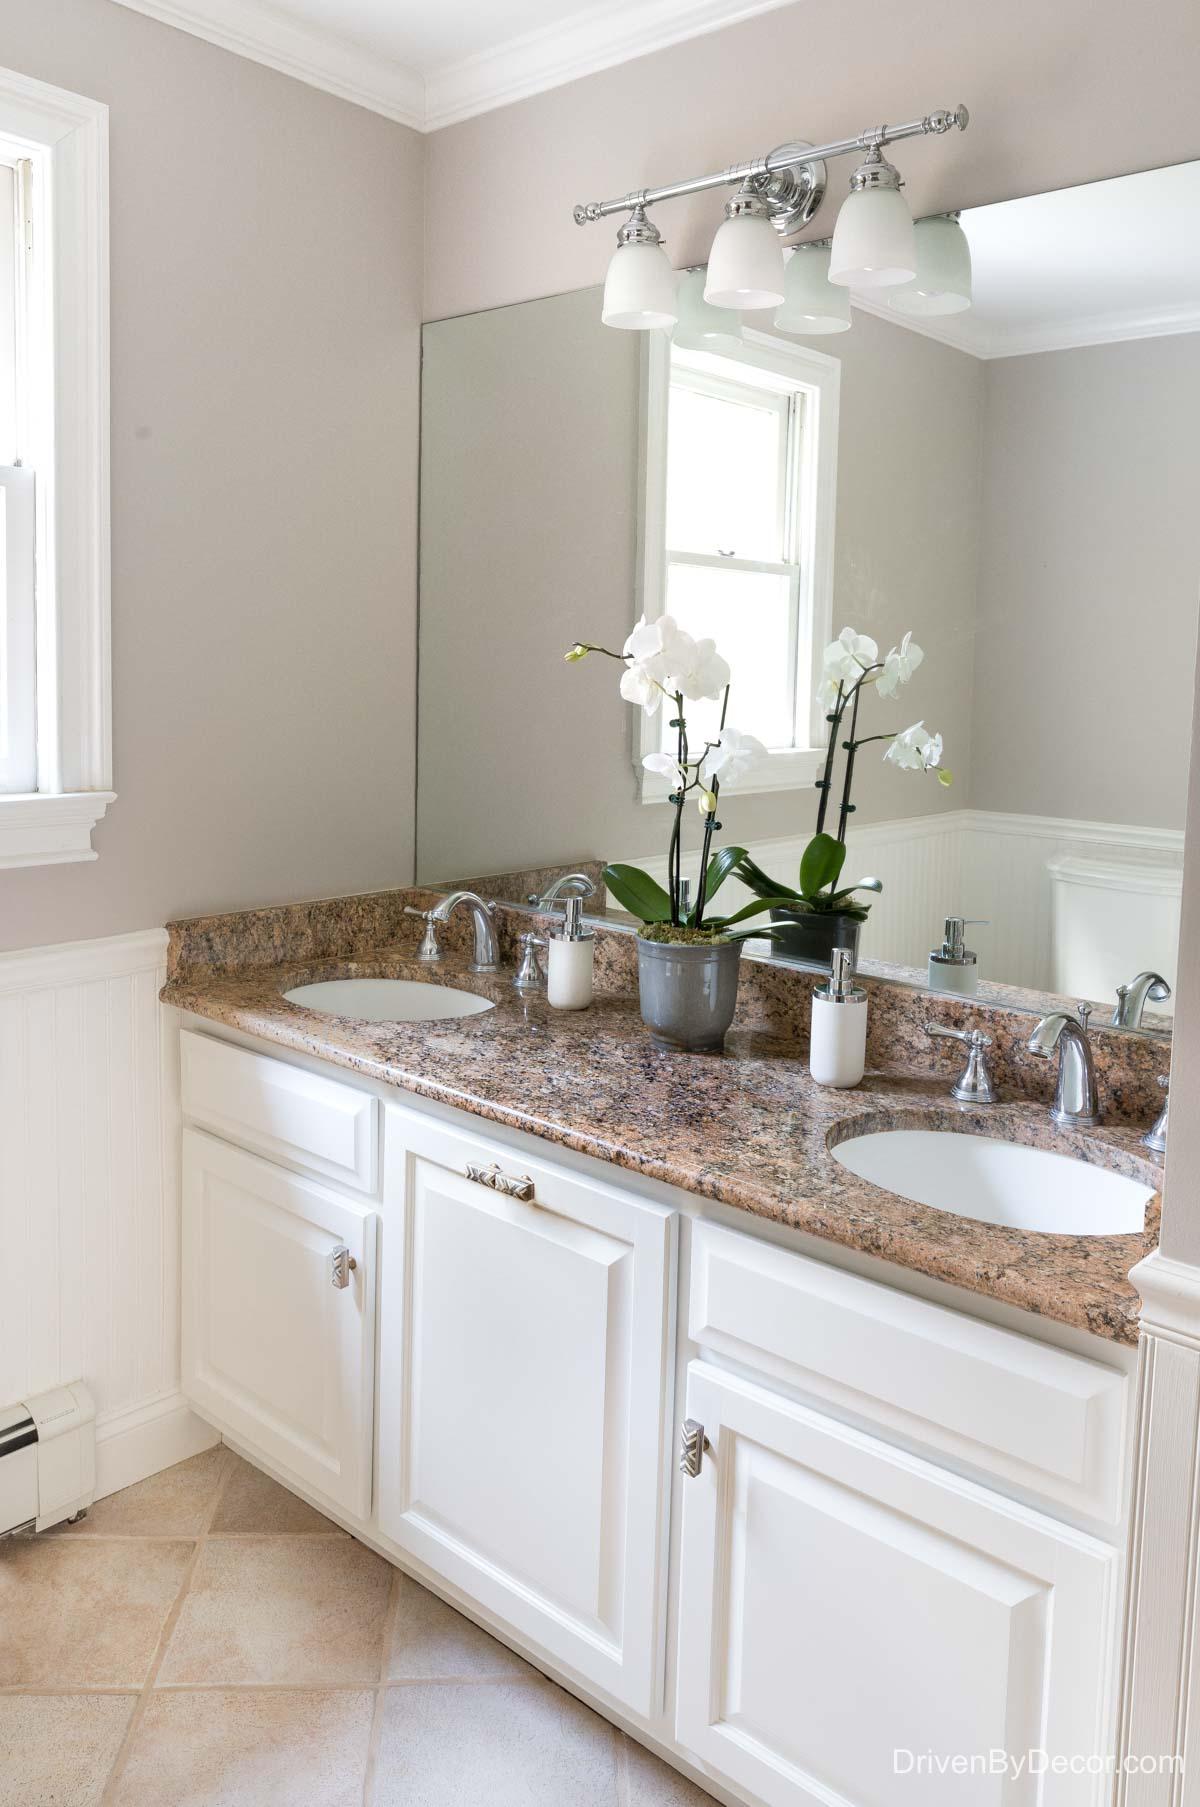 Home remodel: Our kids' bathroom after remodeling!